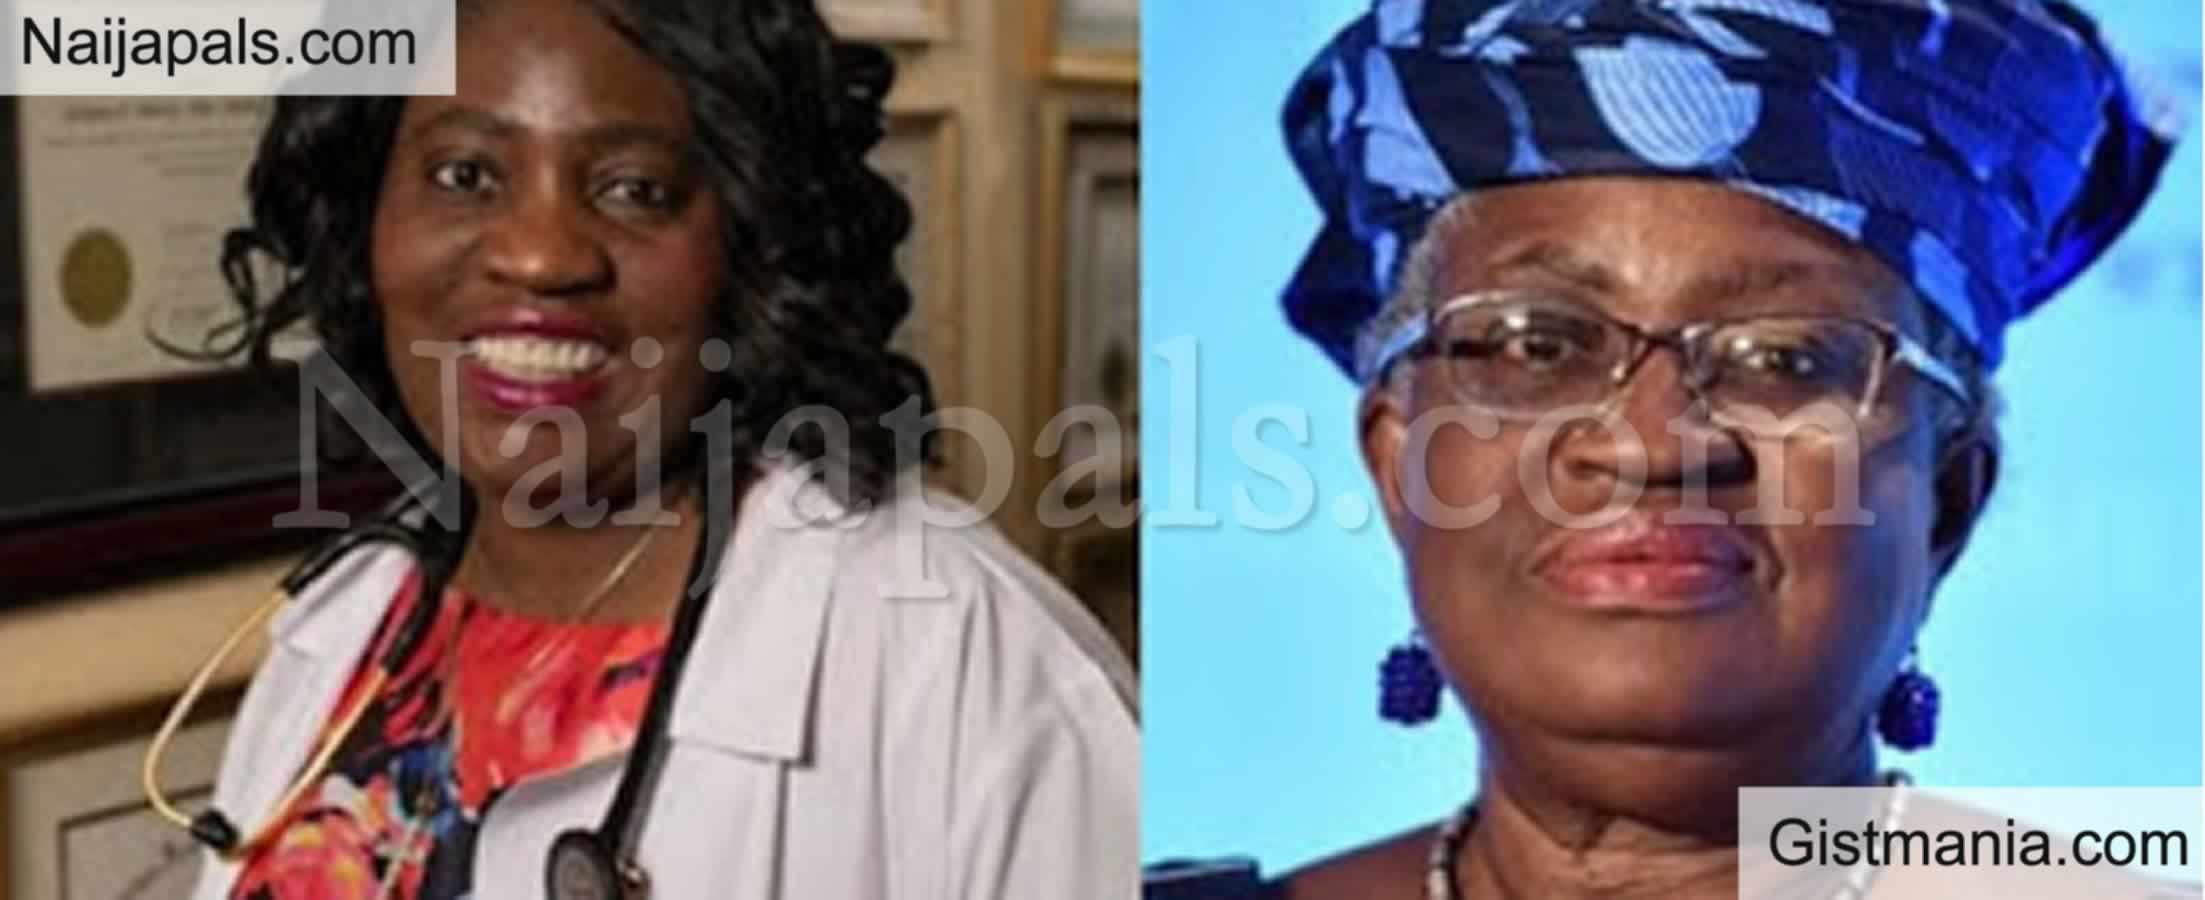 <img alt='.' class='lazyload' data-src='https://img.gistmania.com/emot/thumbs_up.gif' /> <b>Okonjo-Iweala's Sister Wins Family Doctor Of The Year Award In Maryland USA</b>